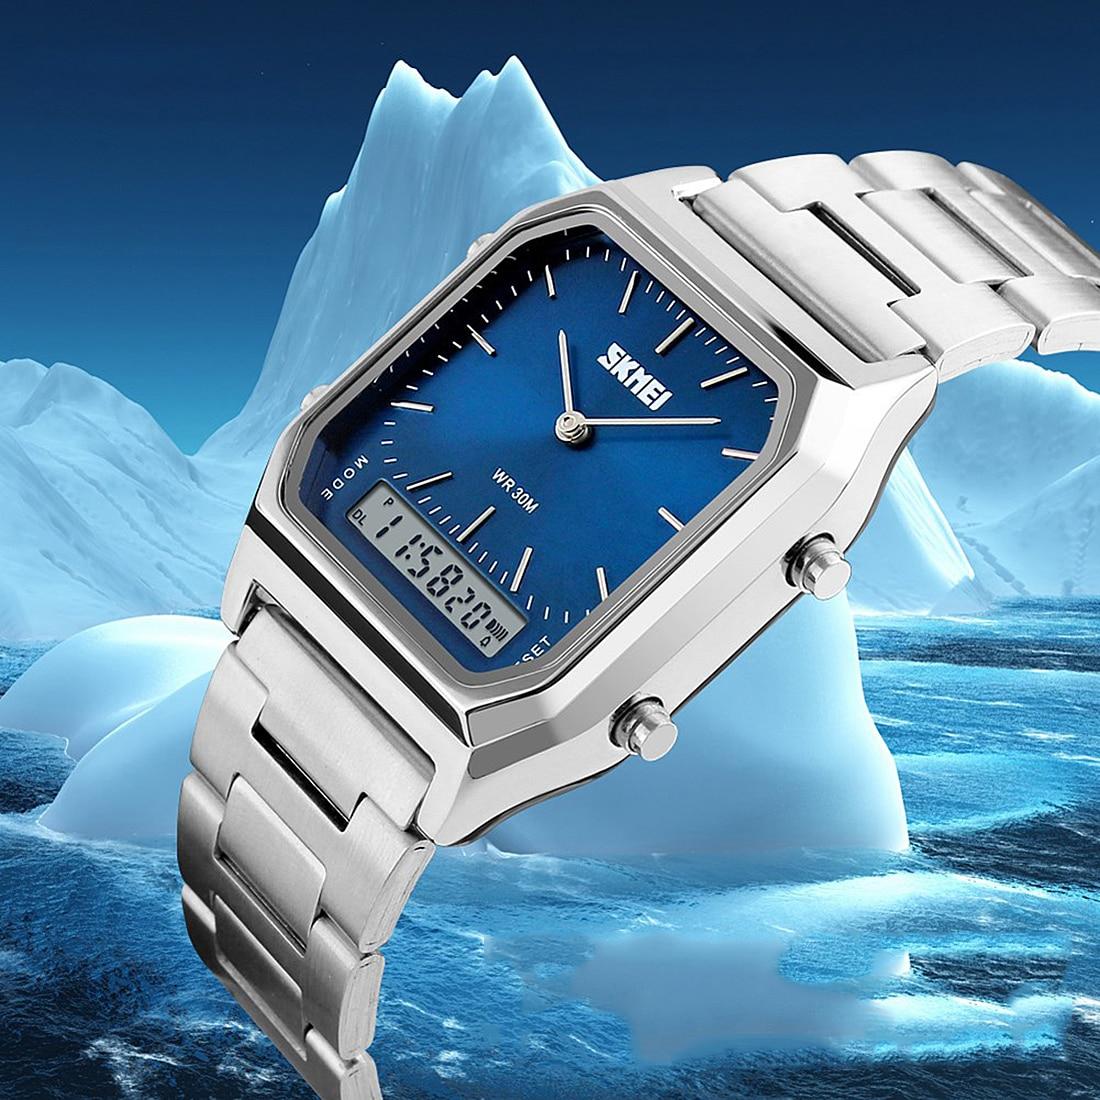 все цены на Quartz Watch Men's Casual Business Women Men Watch Waterproof Casual Watch Stainless Steel Wristwatch Clock Relogio Masculino